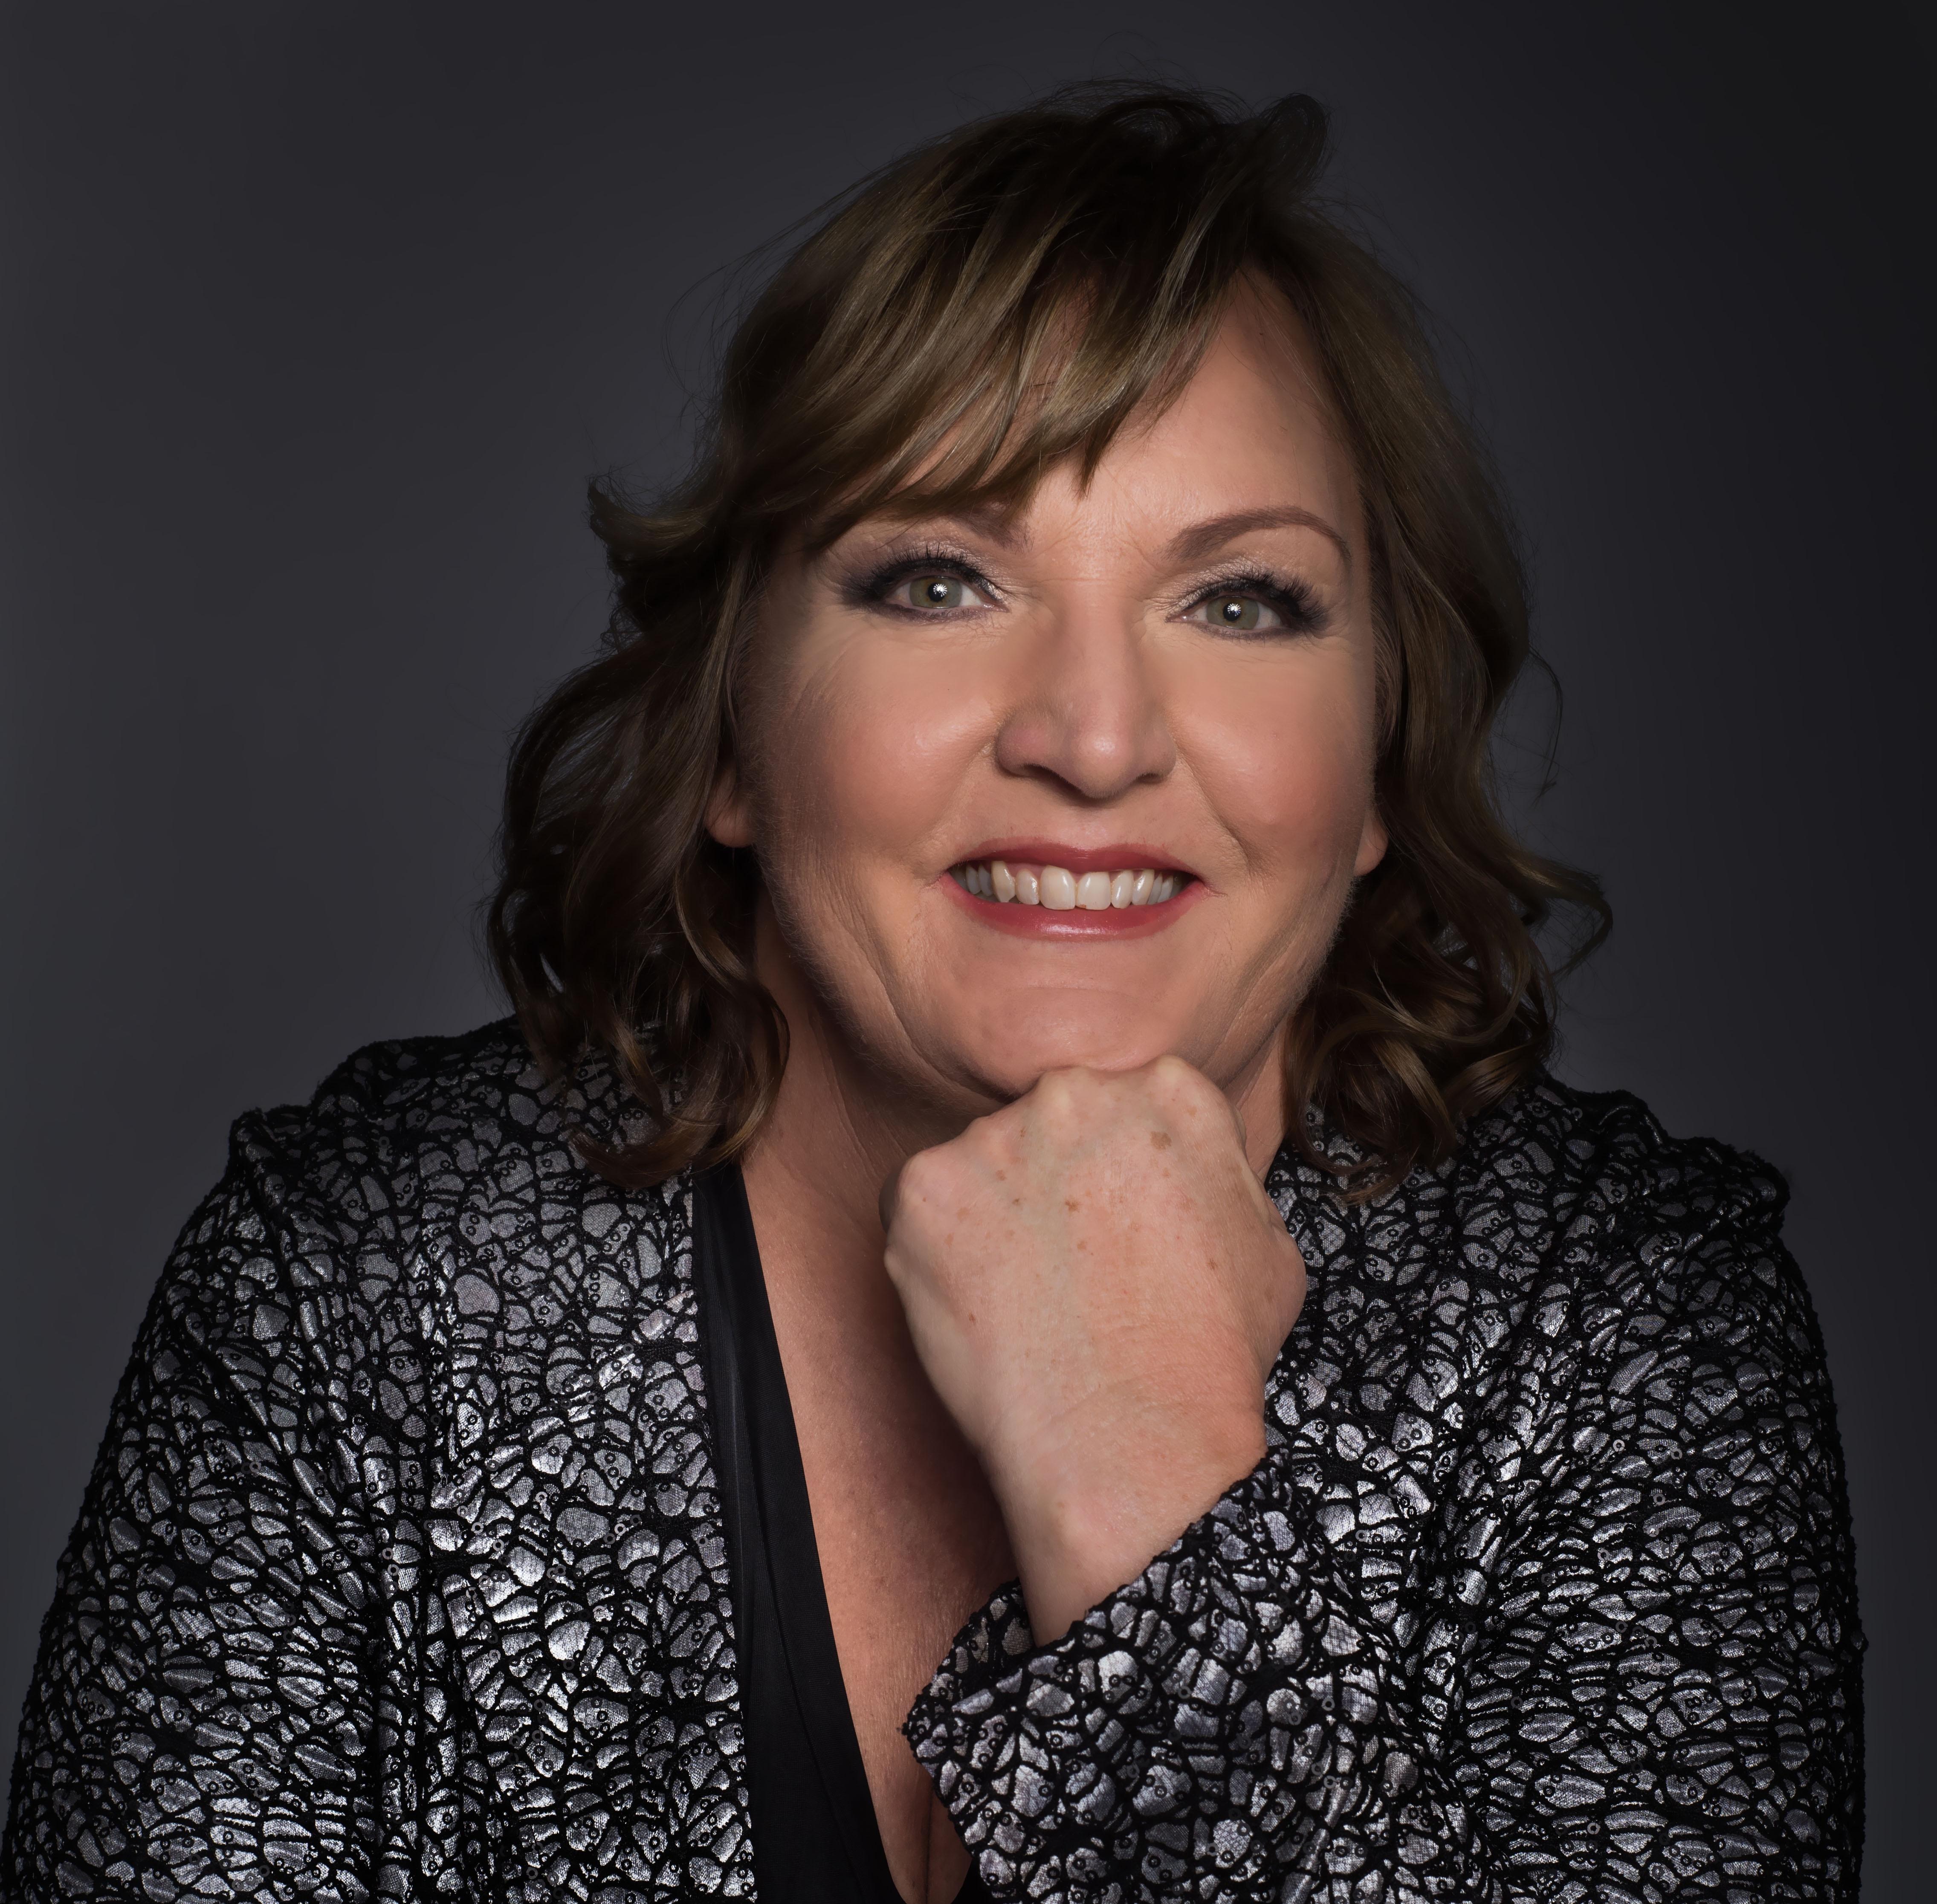 Lorraine Taylor